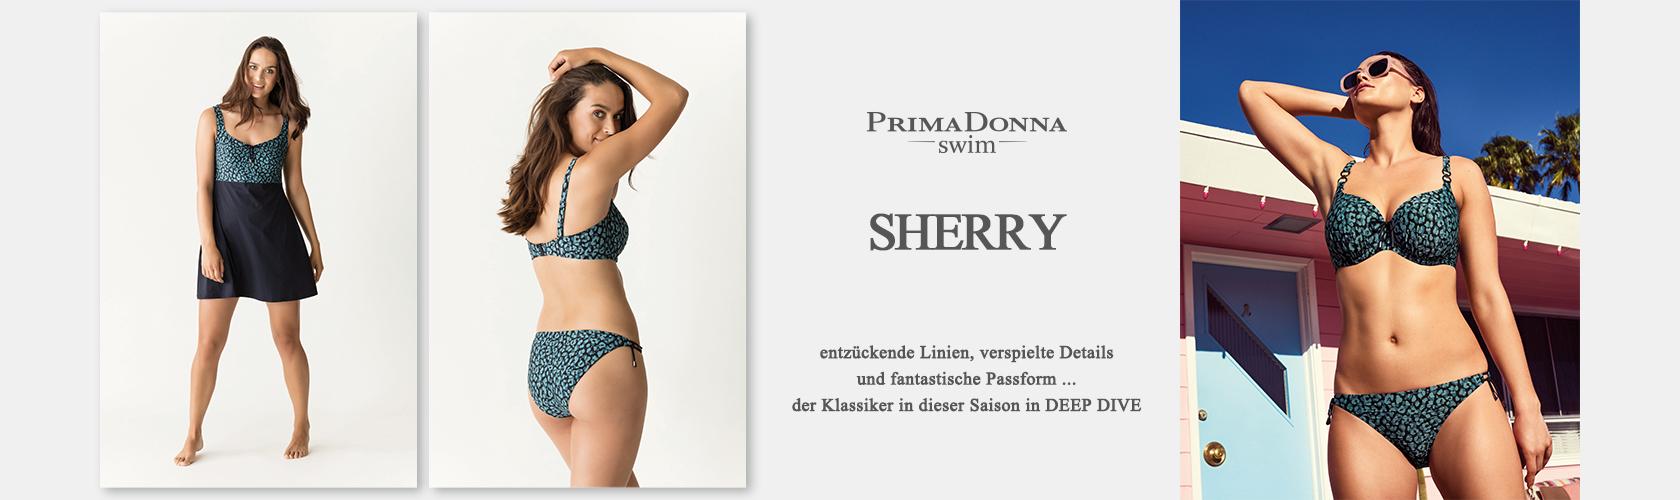 Slideshow SHERRY DDI 14.06.